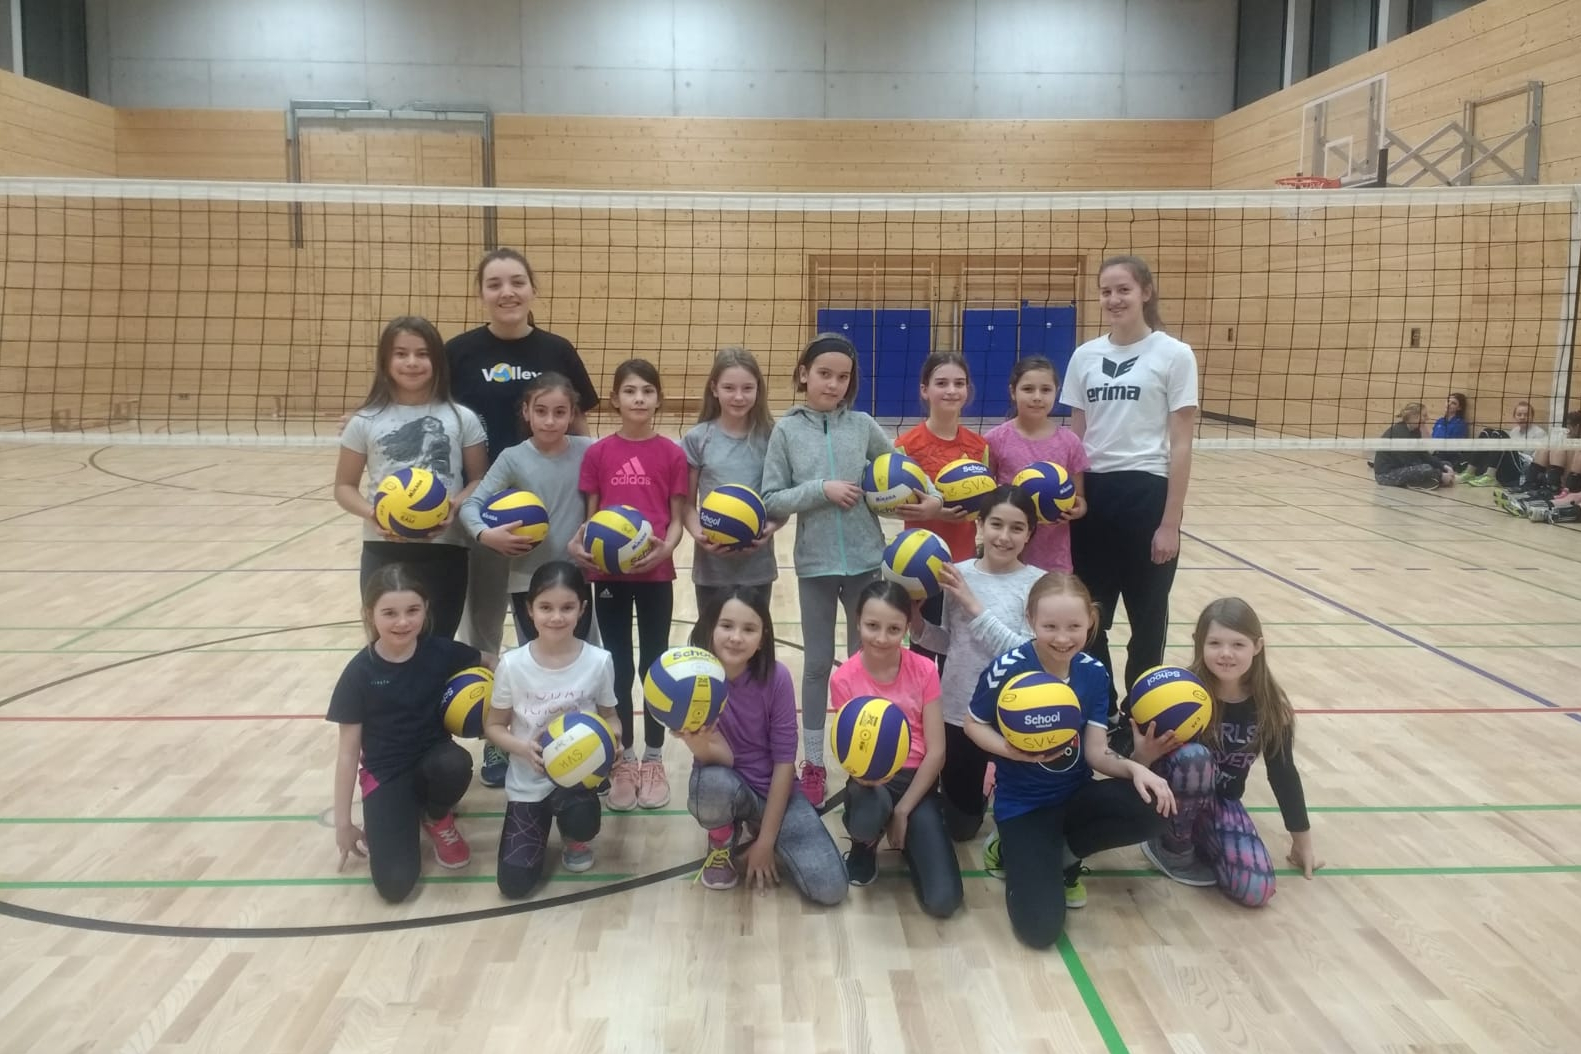 U13 2019 SV Salamander Kornwestheim Volleyball